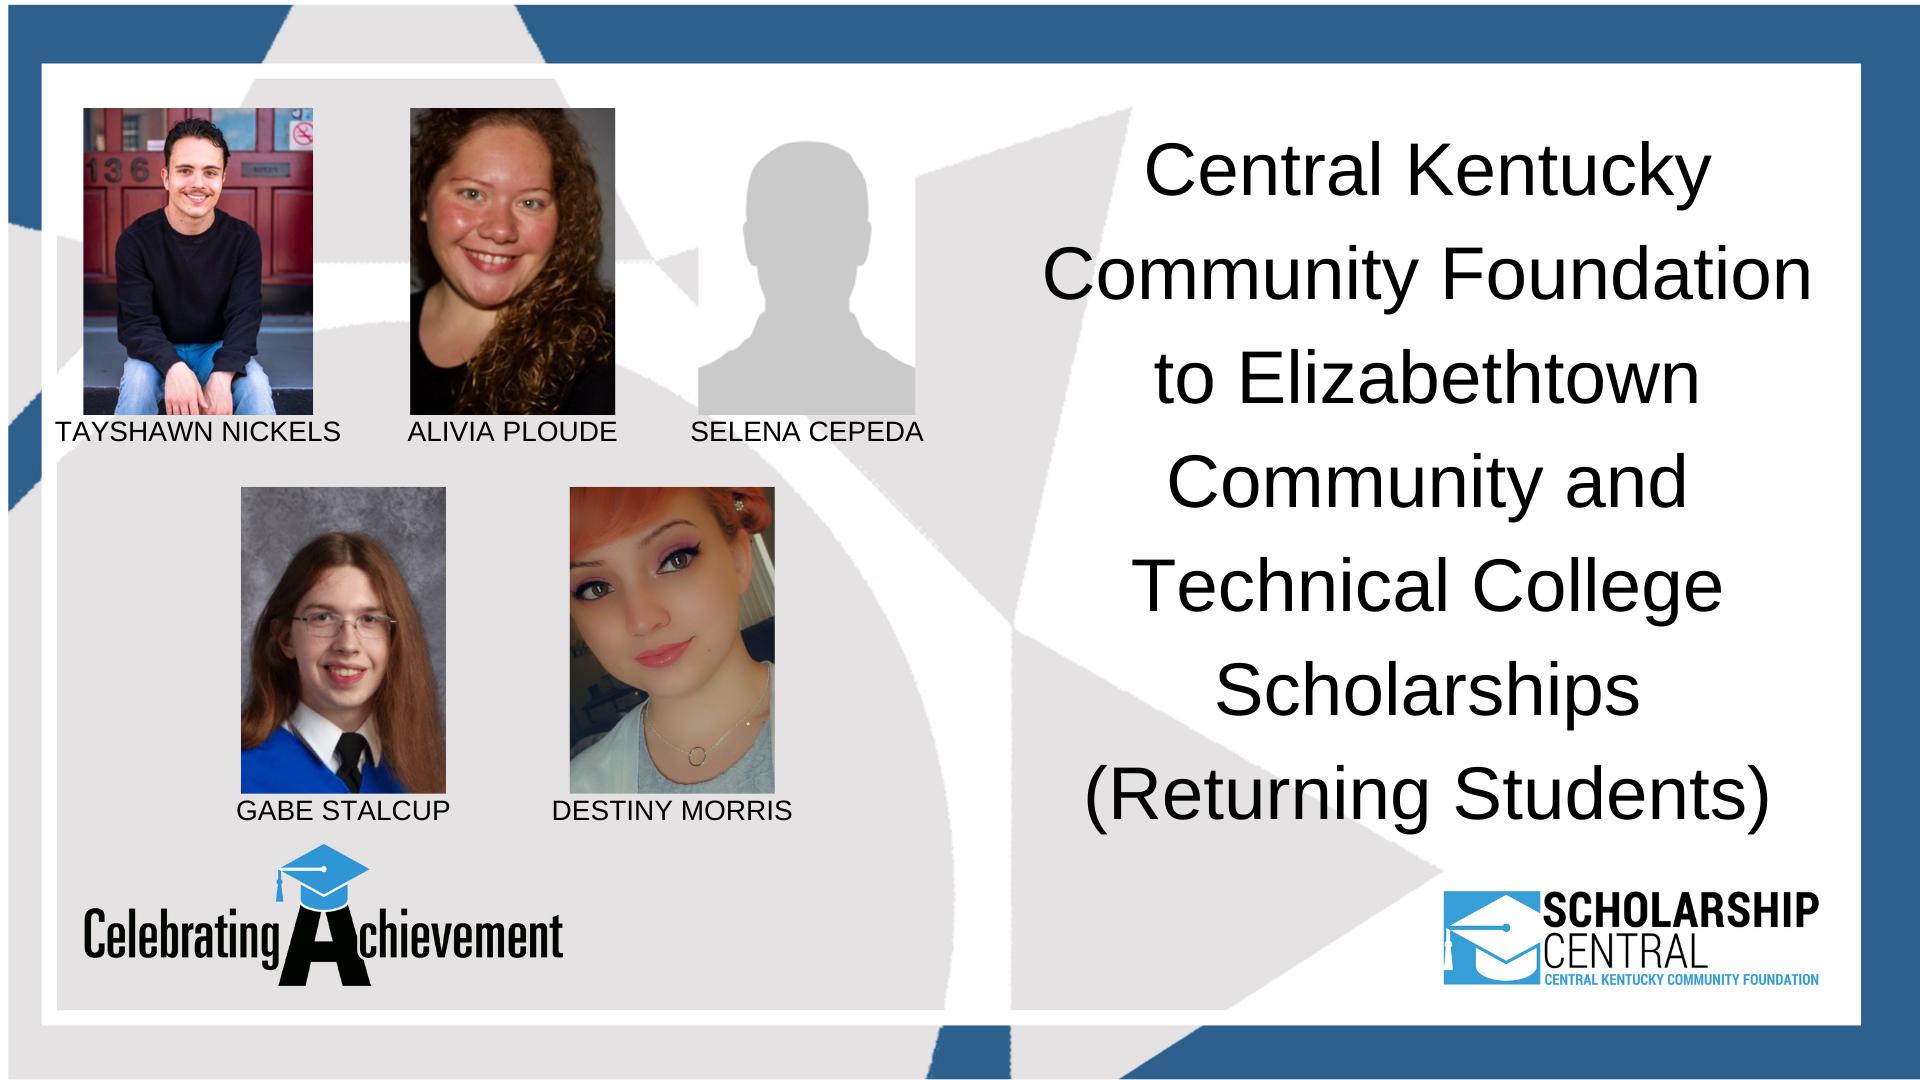 CKCF to ECTC Scholarship RETURNING Winners 2